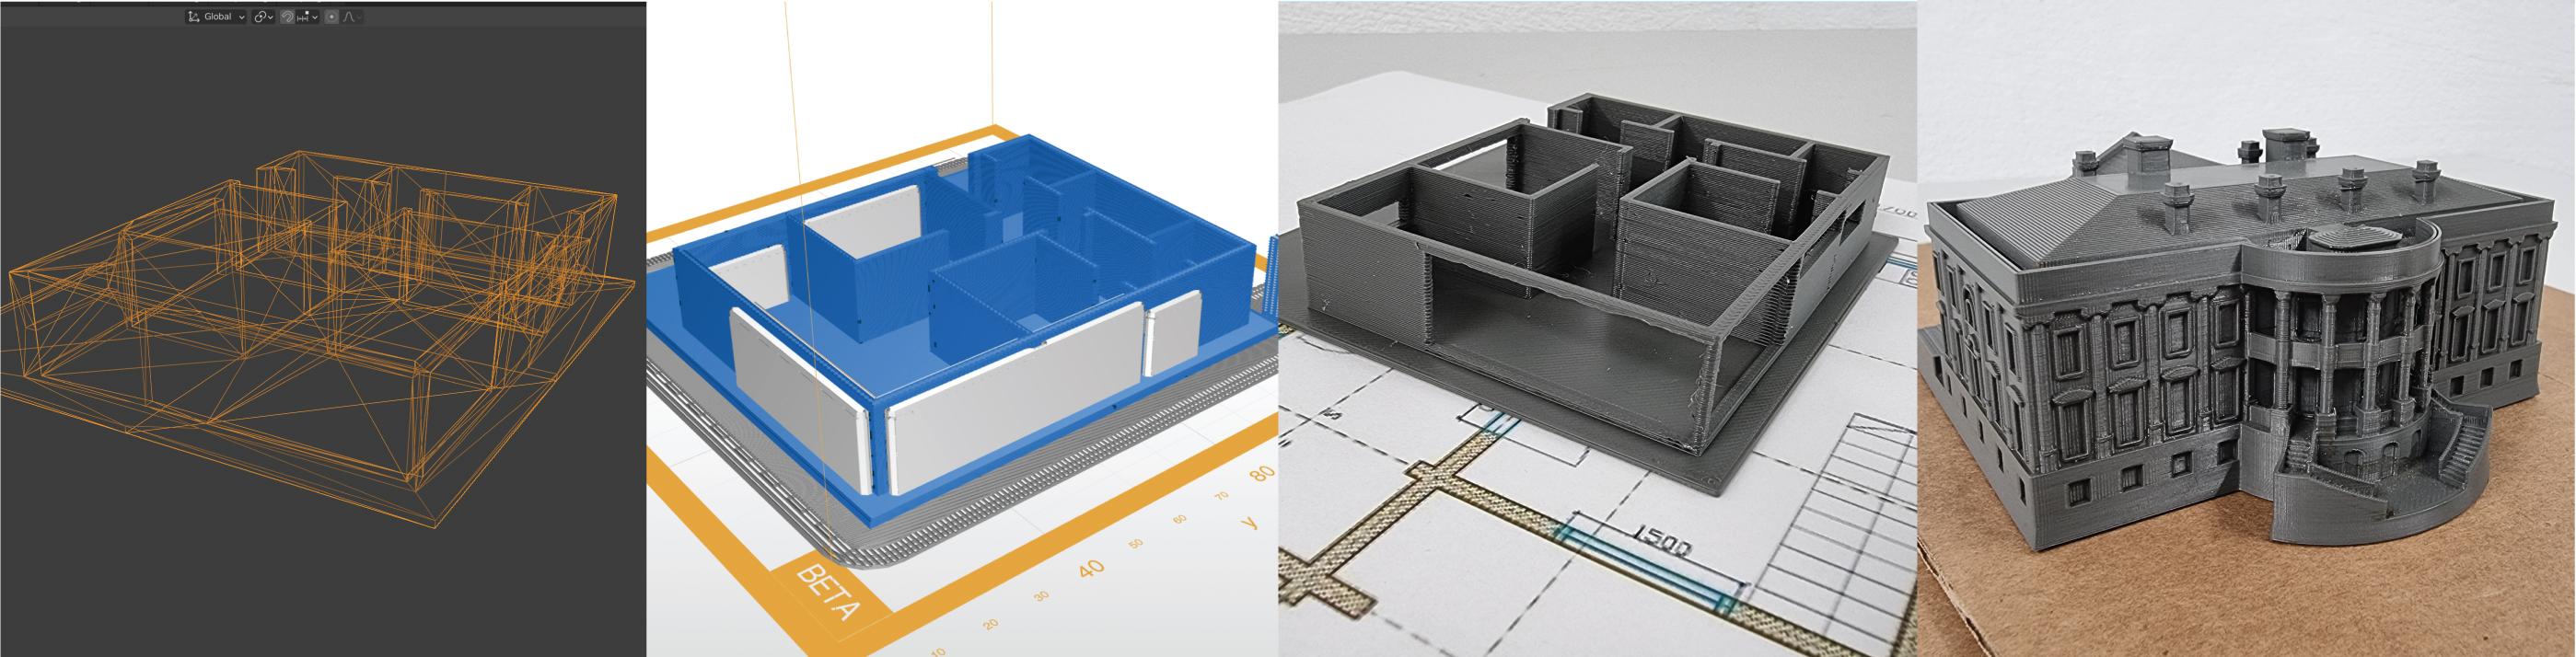 3D druka arhitektūrā